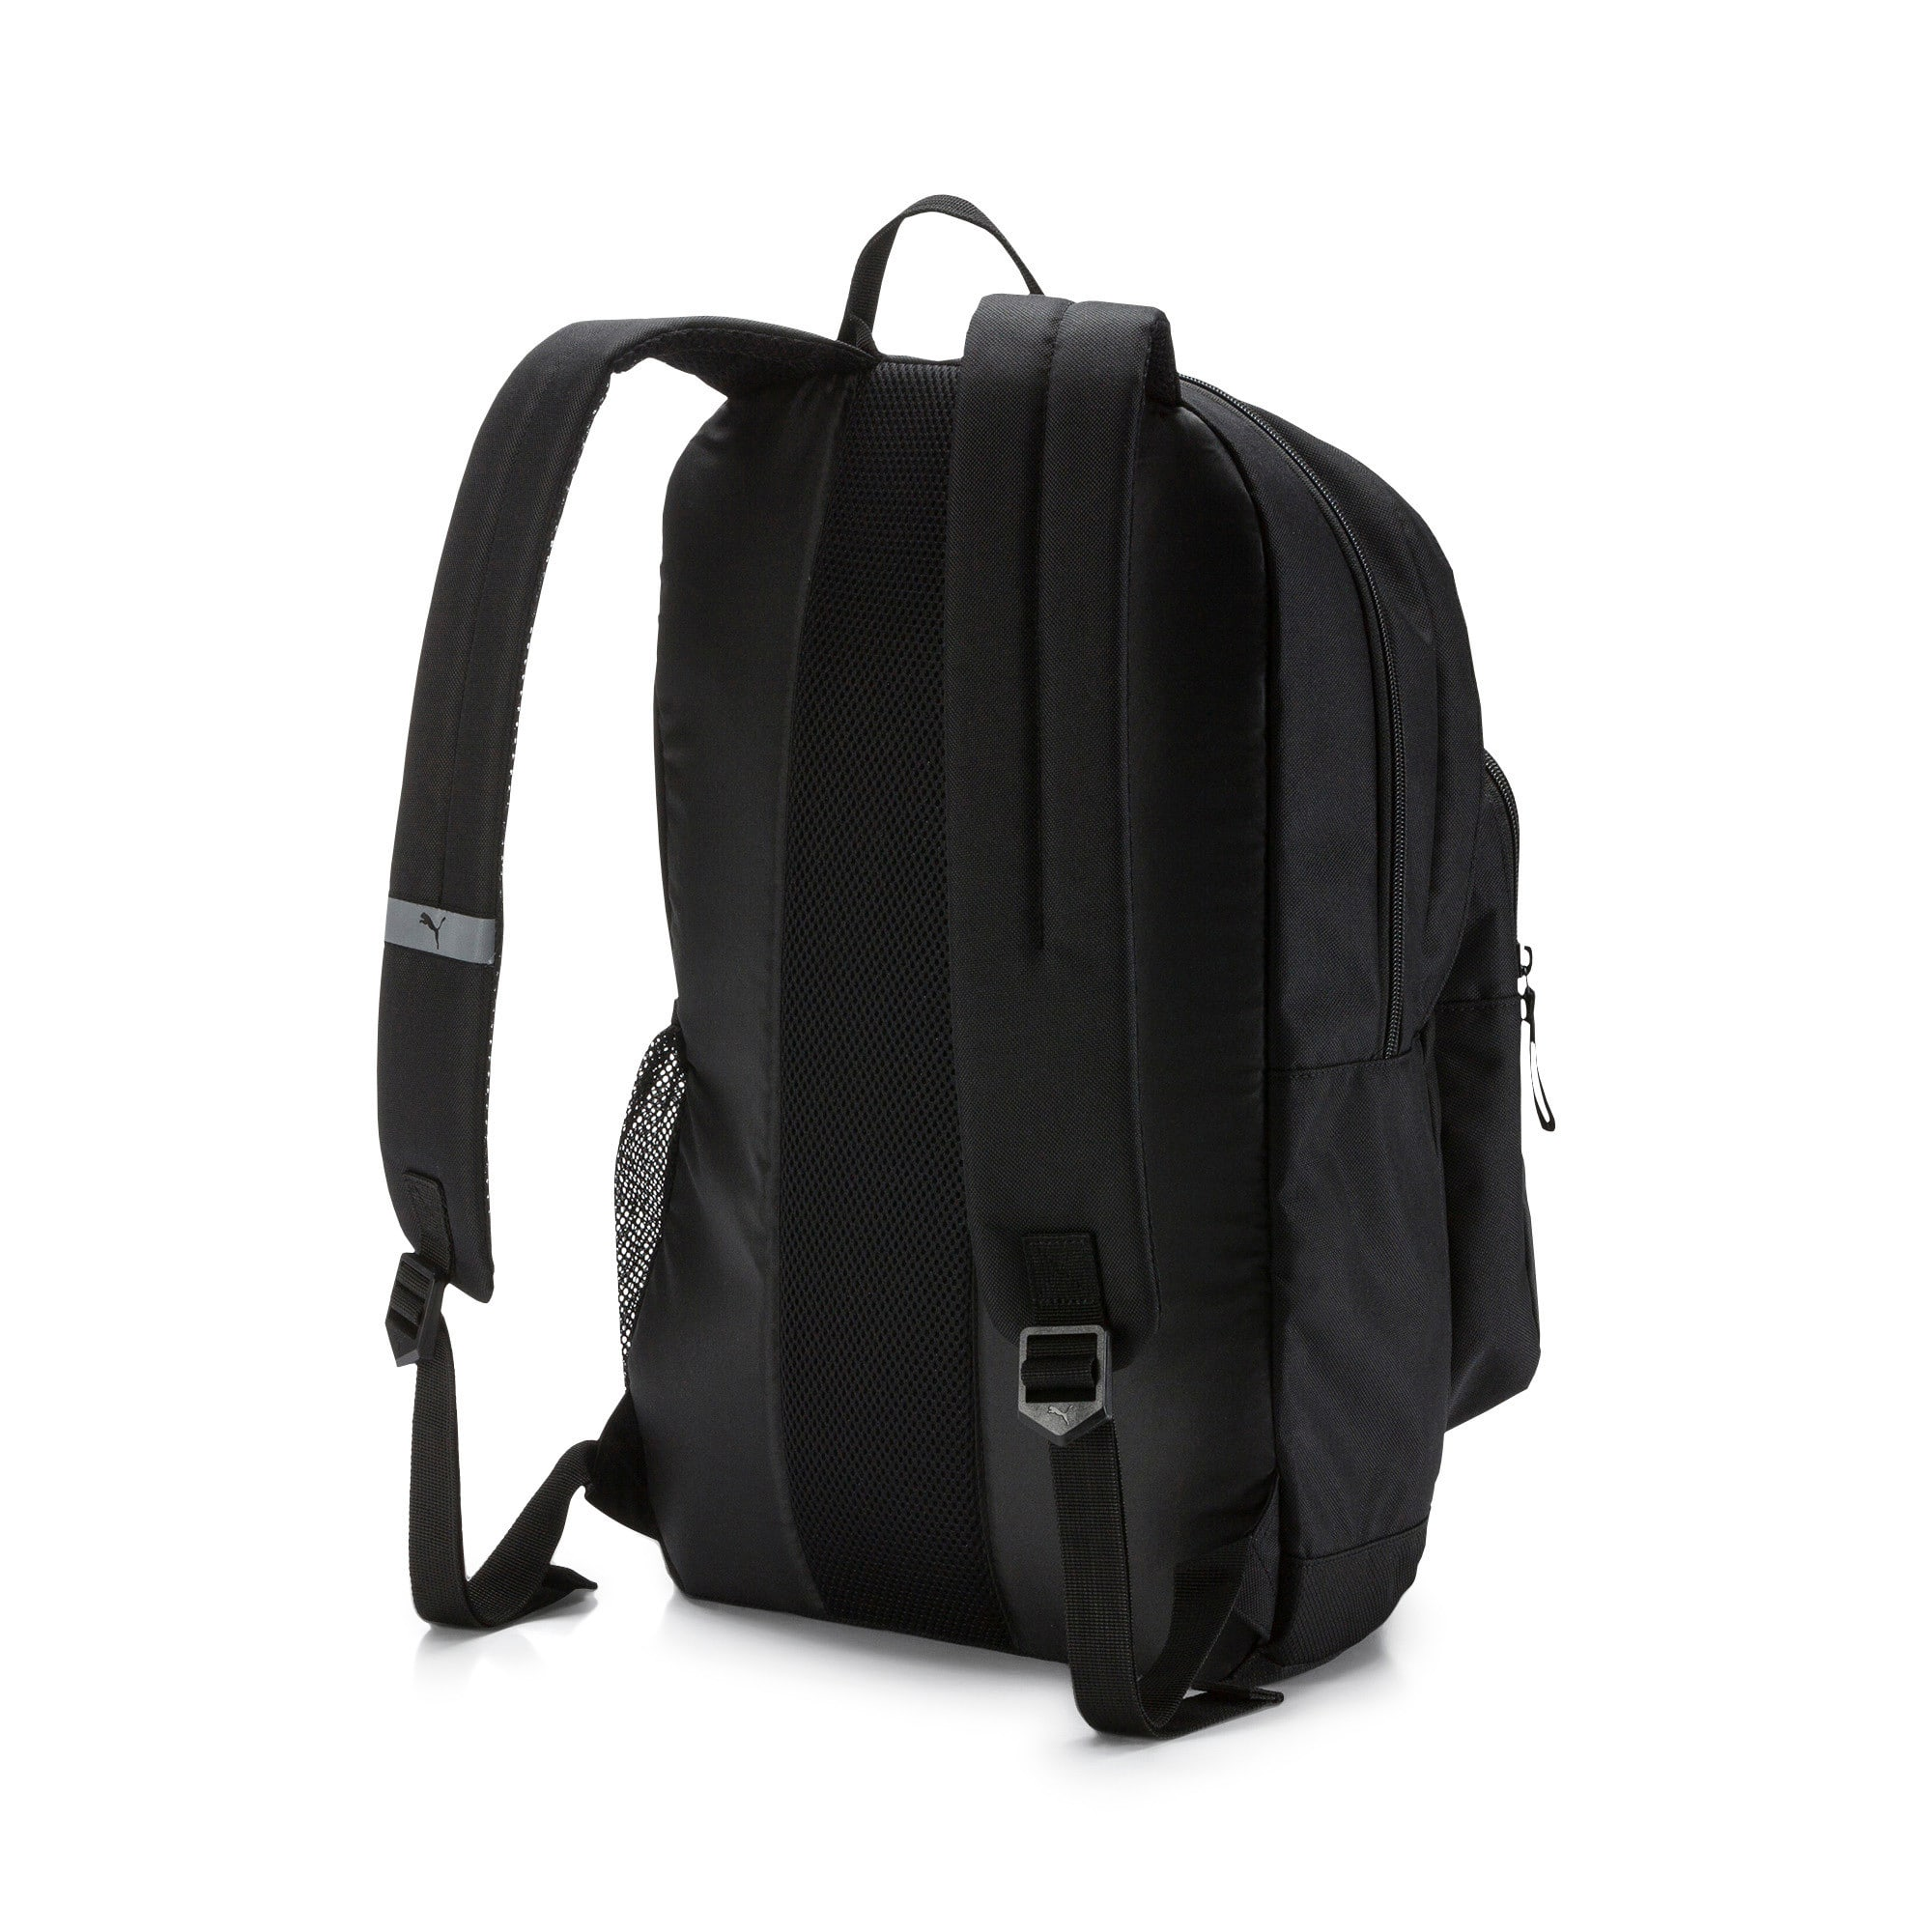 Thumbnail 3 of Deck Backpack II, Puma Black, medium-IND